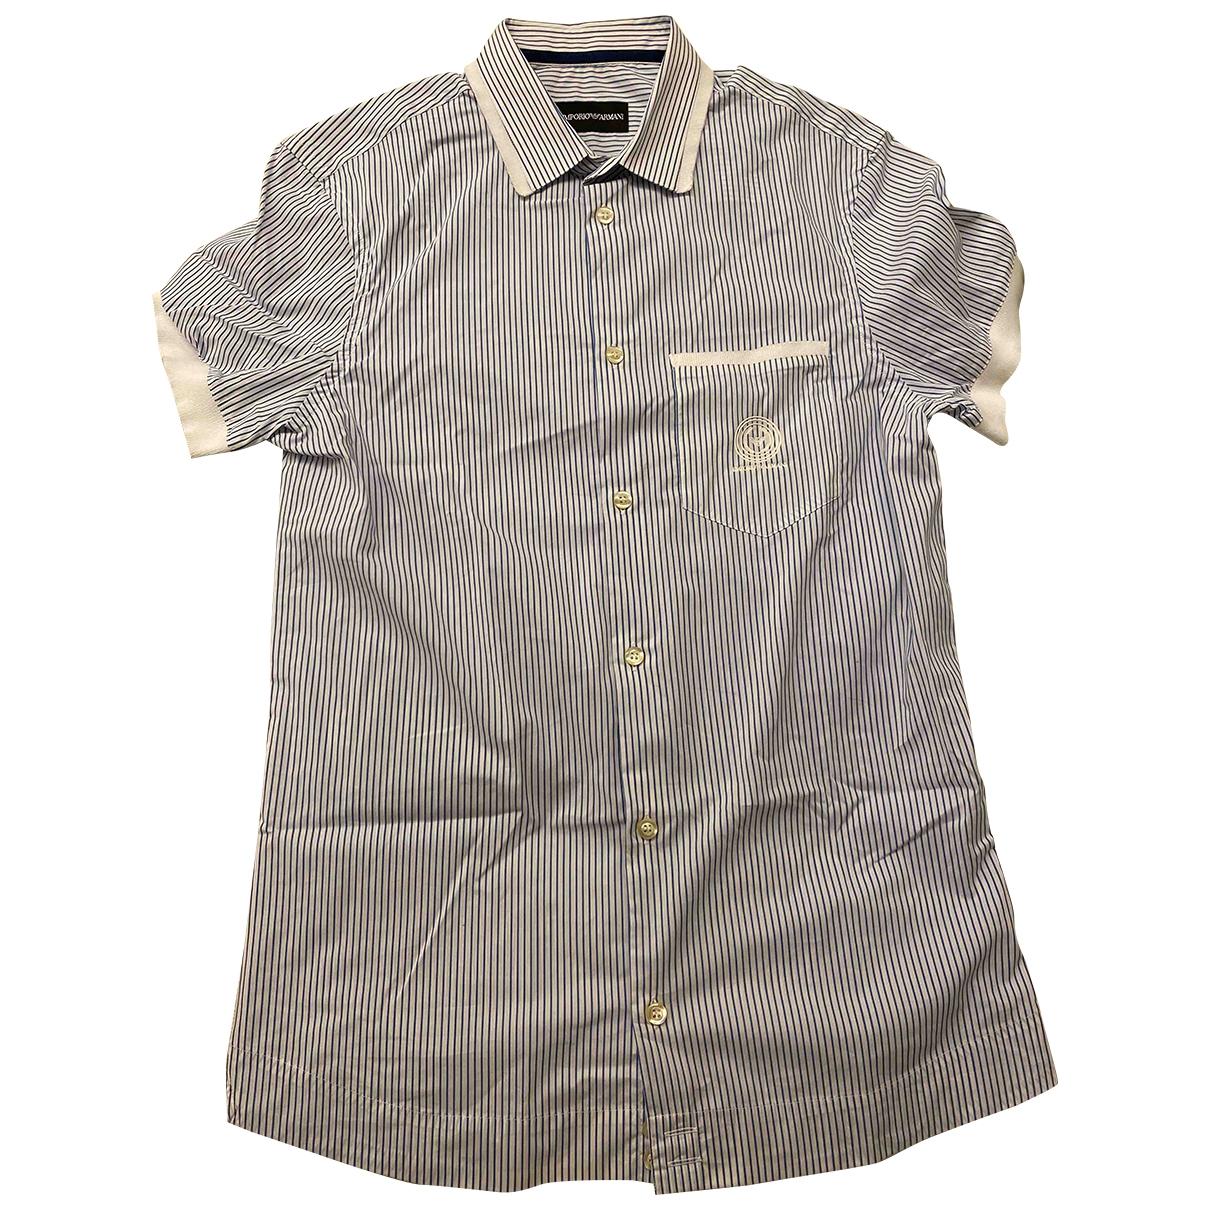 Camisas Emporio Armani